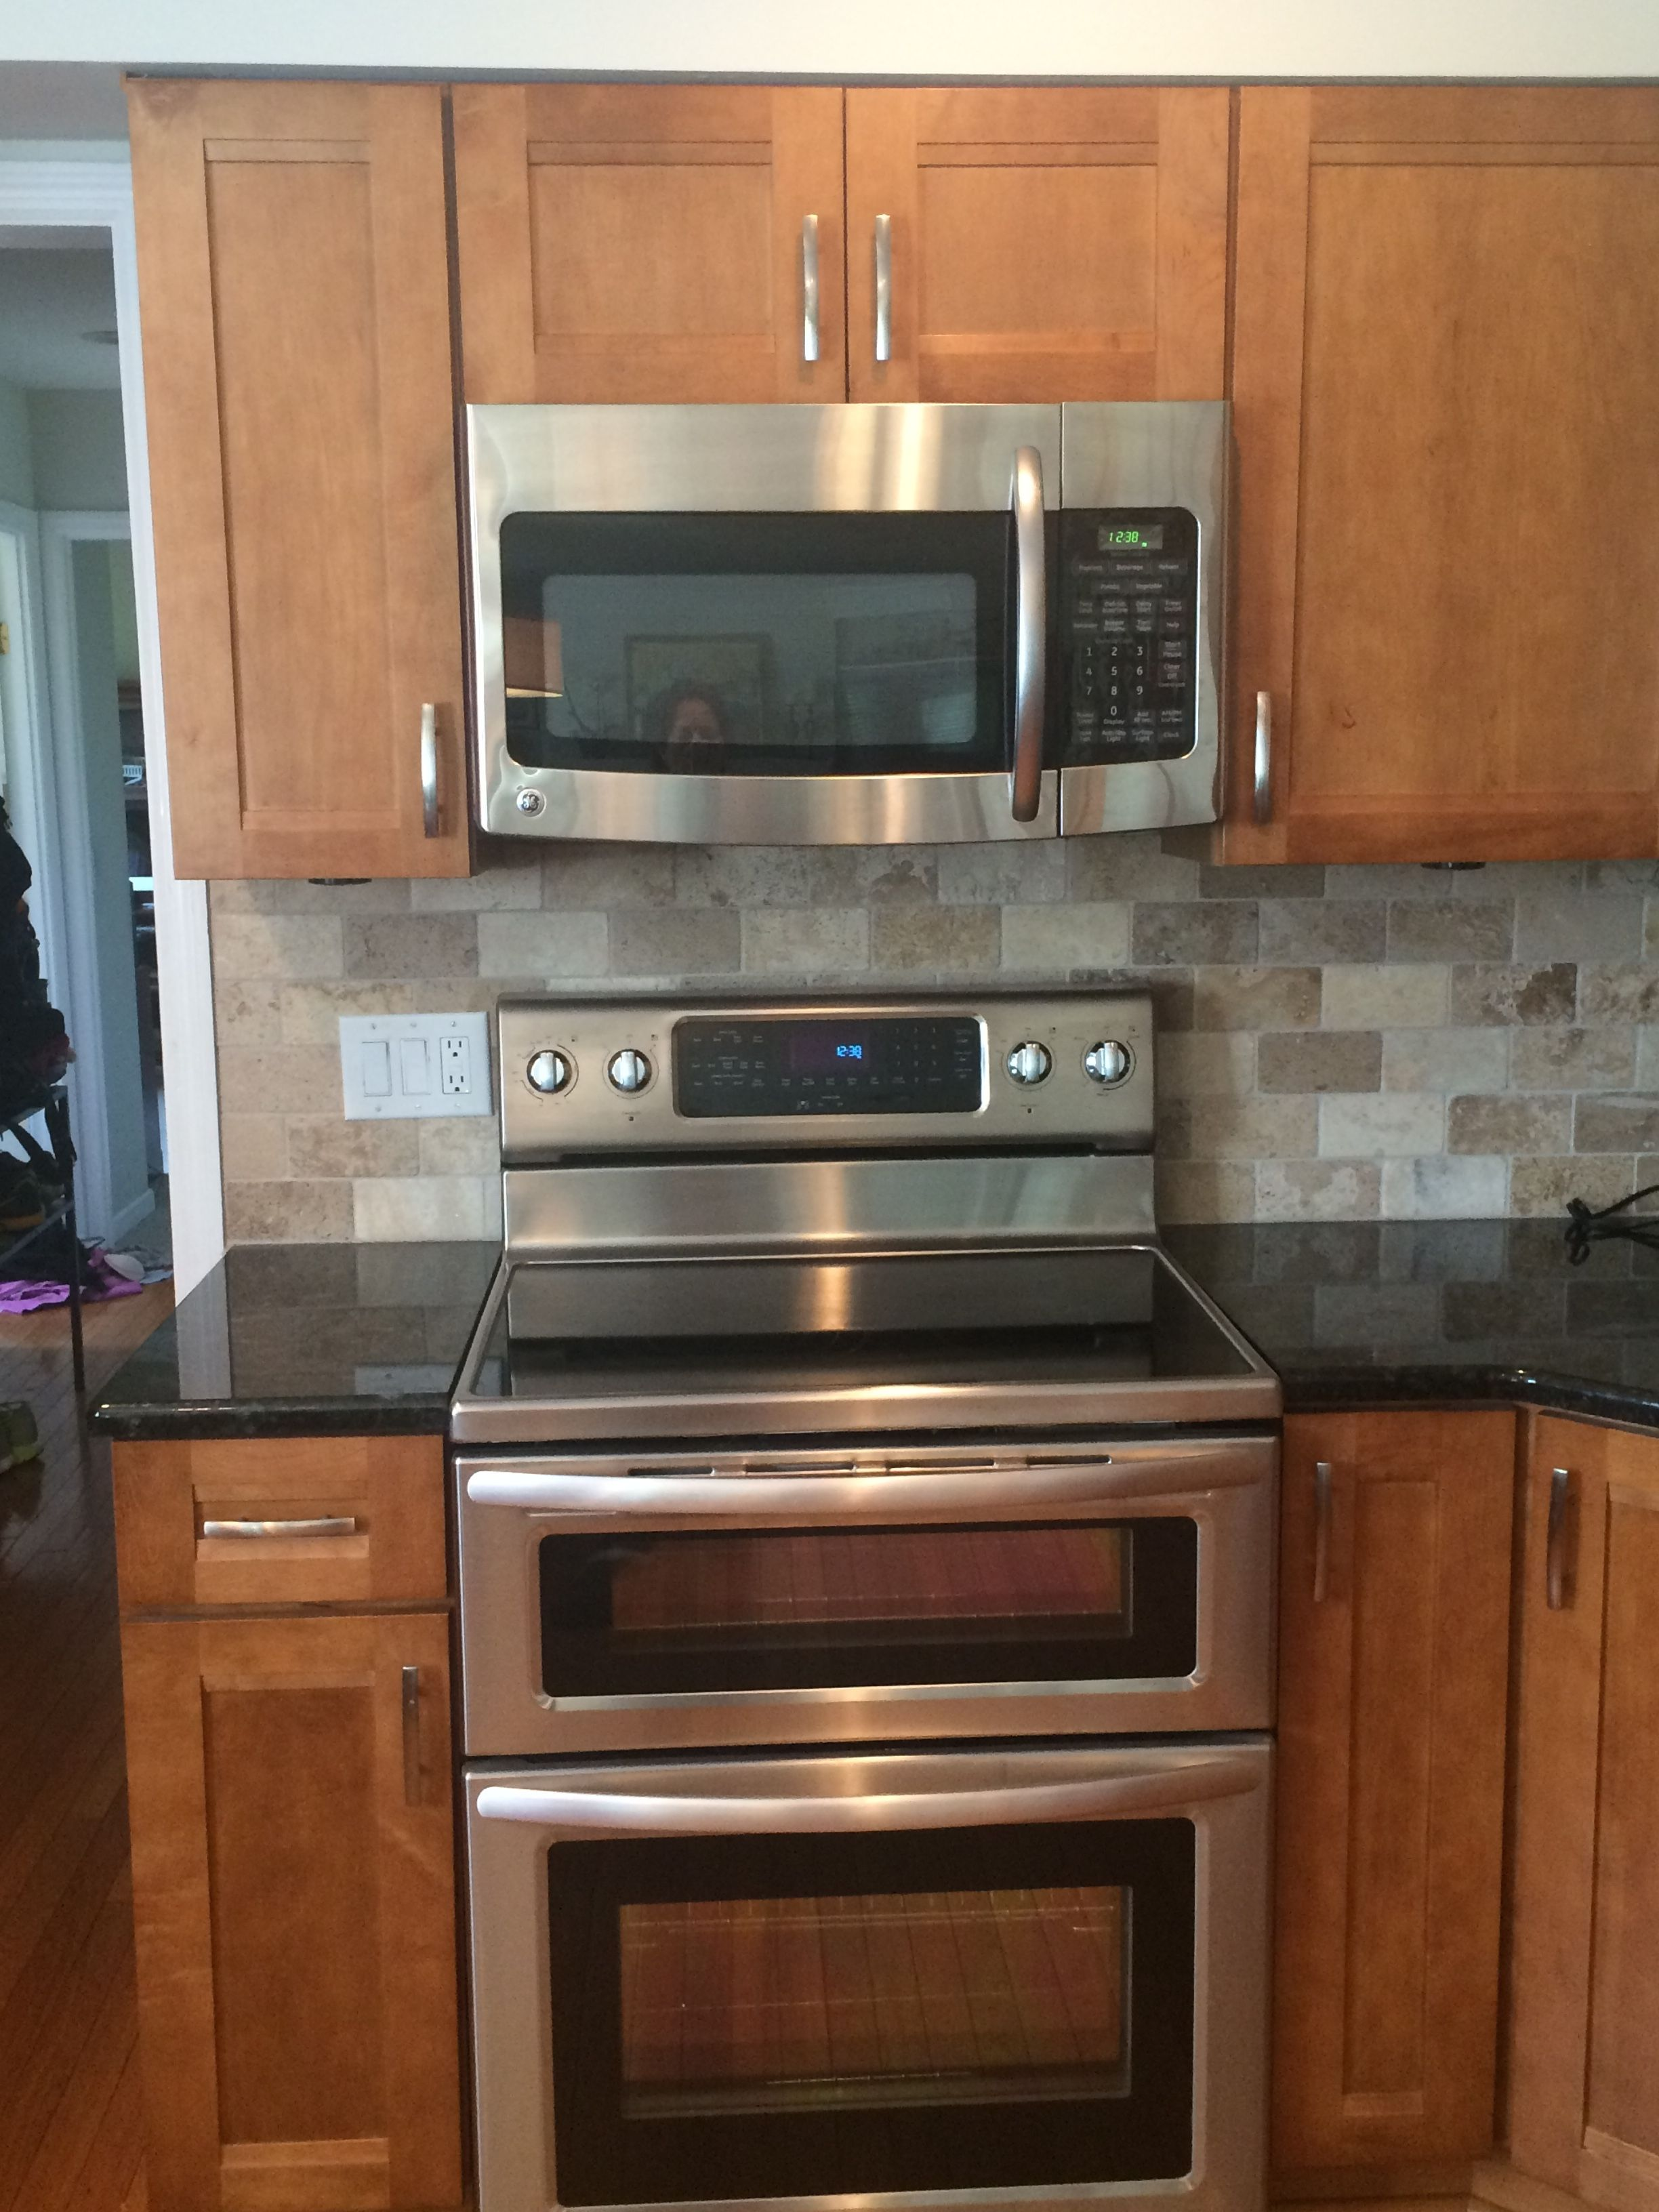 diamond kitchen cabinets In the kitchen Kraftmaid Sedona Maple Praline Labrador Gold granite